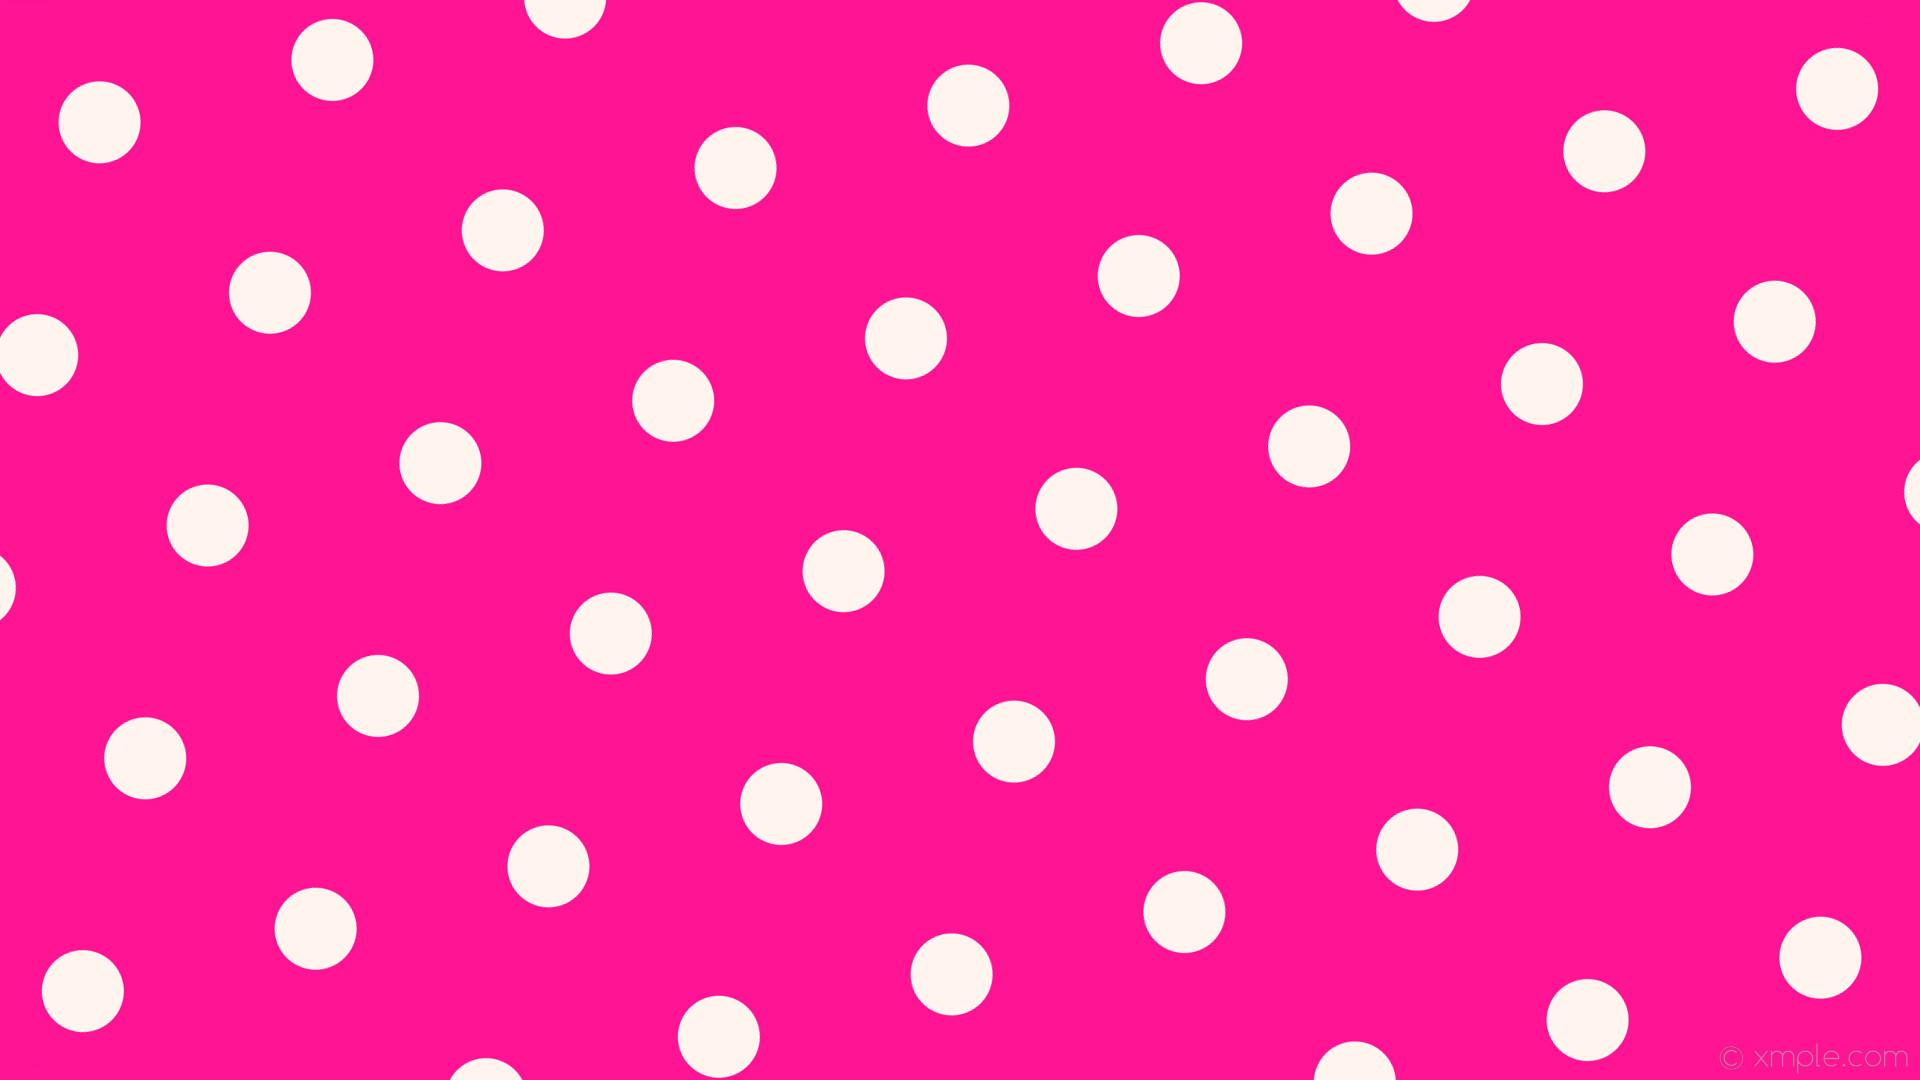 wallpaper white pink polka dots hexagon deep pink seashell #ff1493 #fff5ee  diagonal 15°